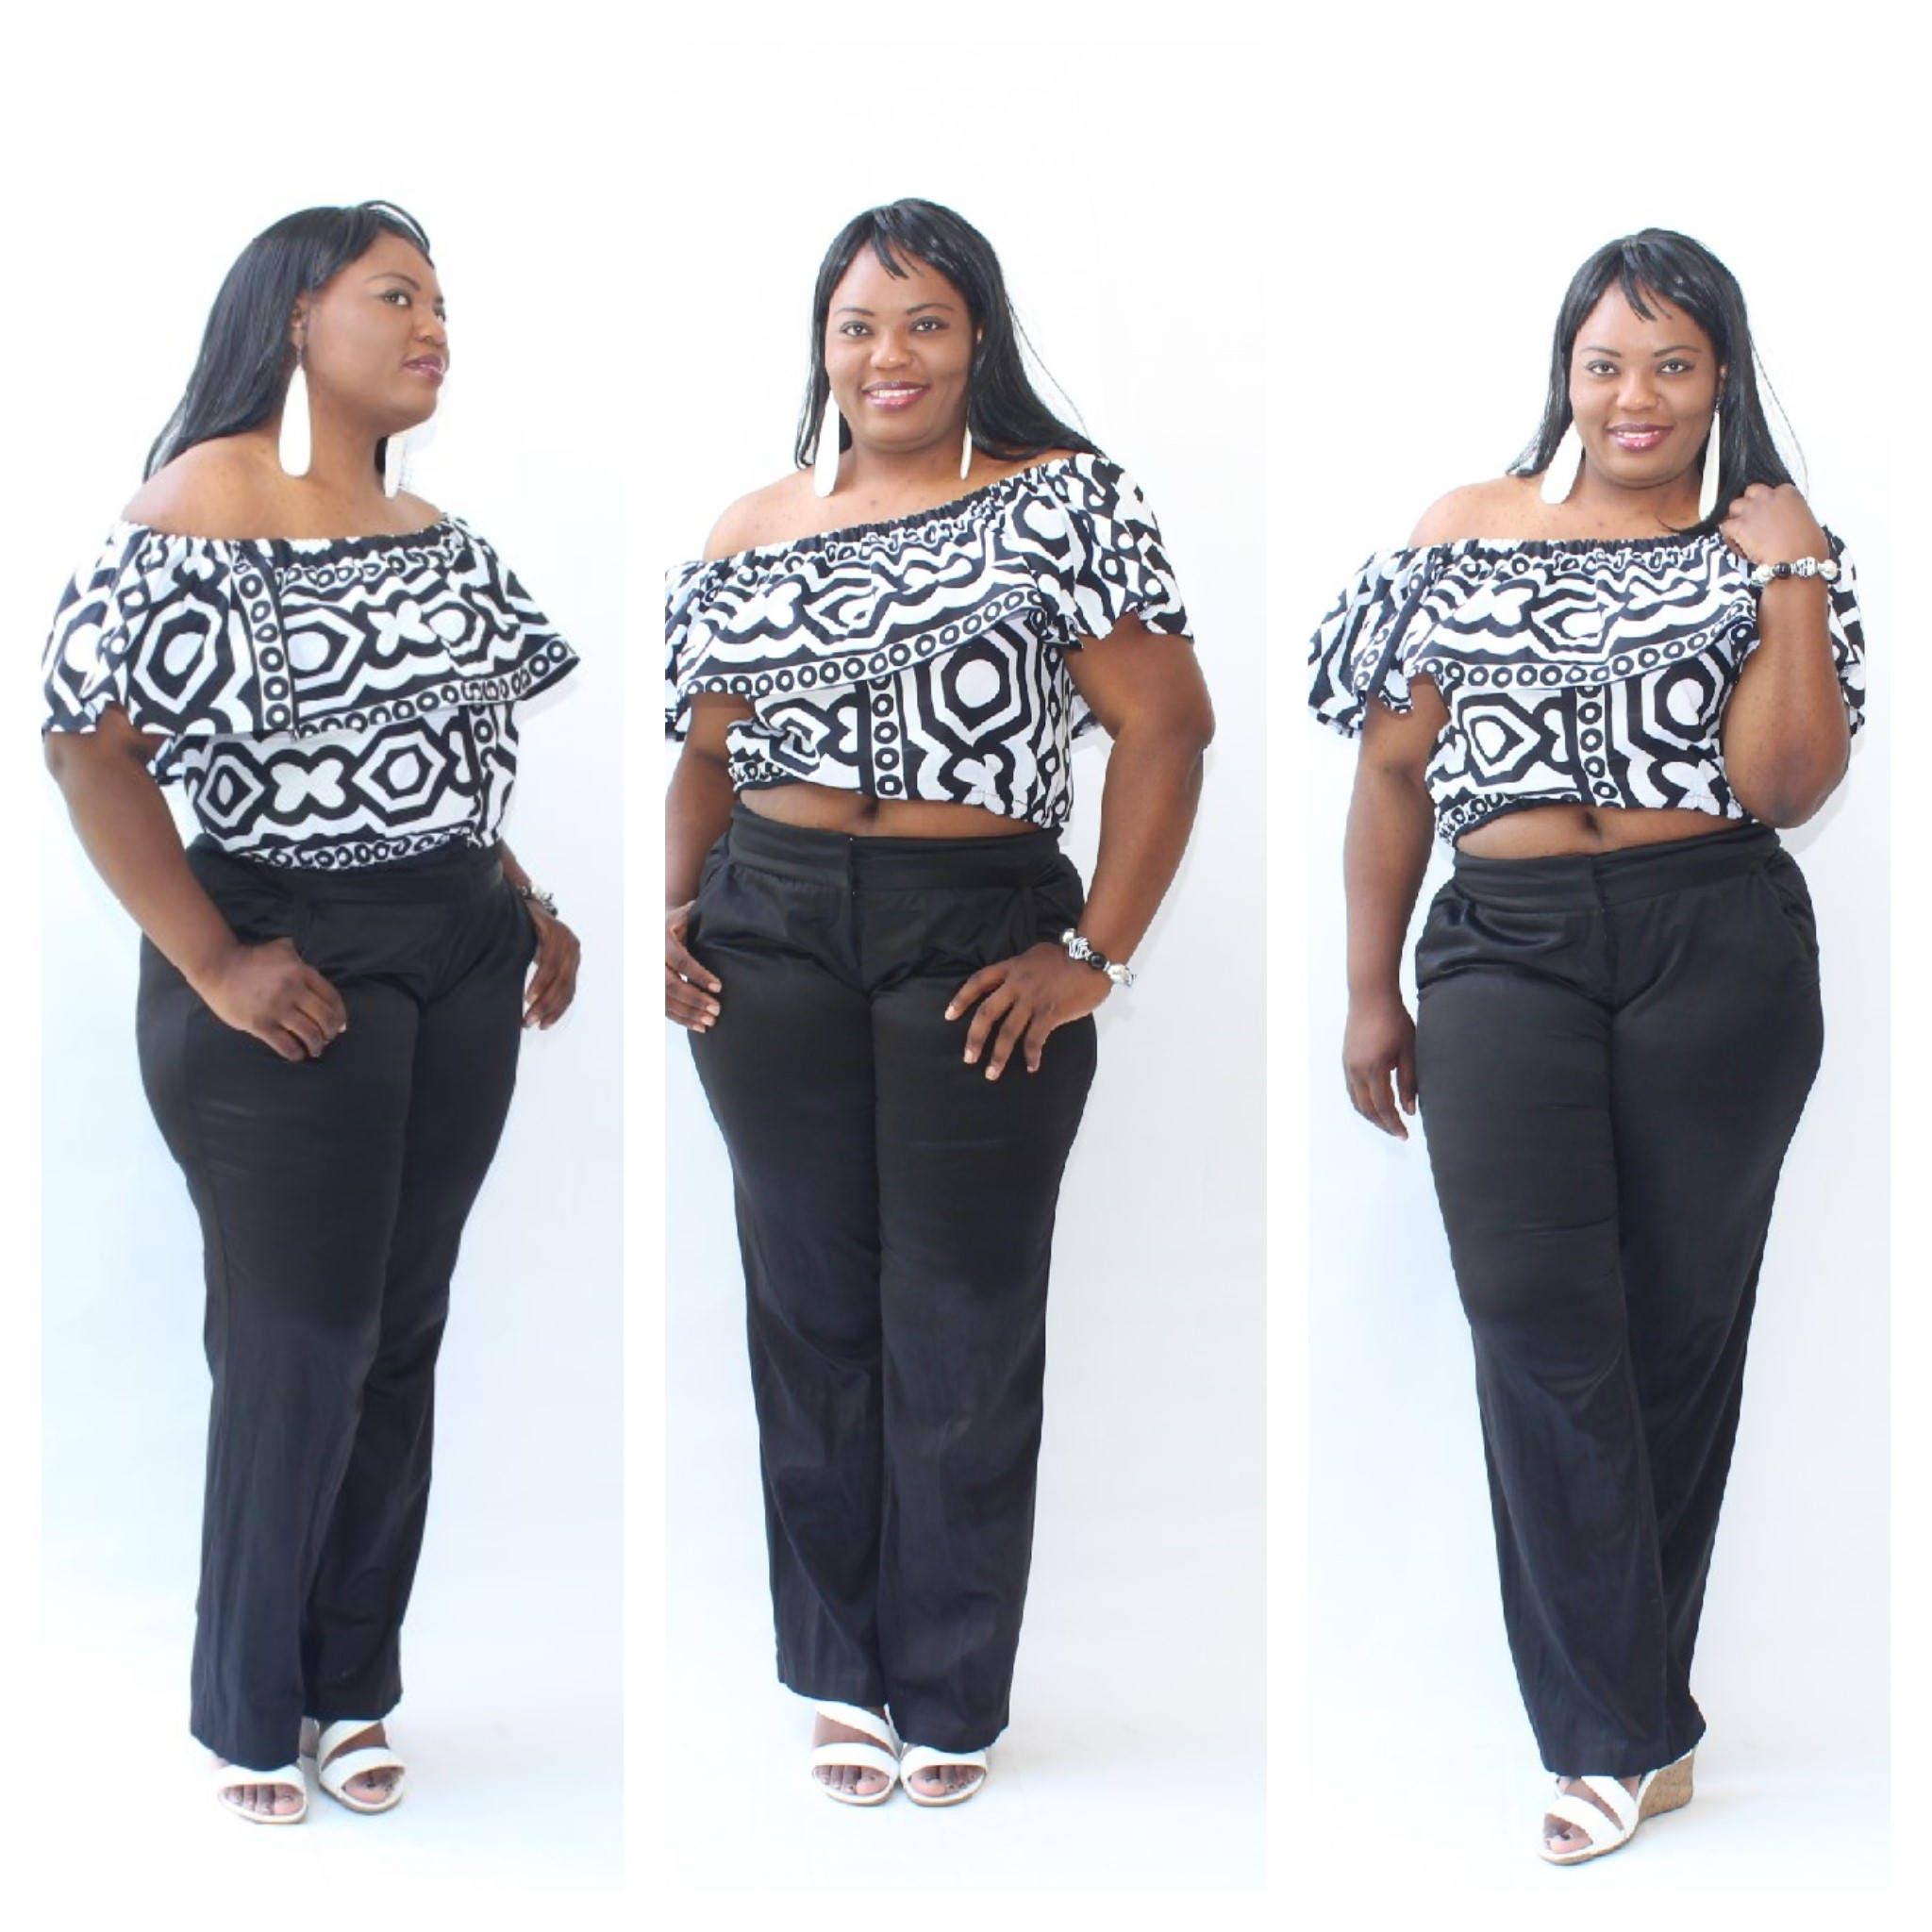 45751ef1b9dff7 NEW African Print Crop Top Tribal Print off shoulder Top